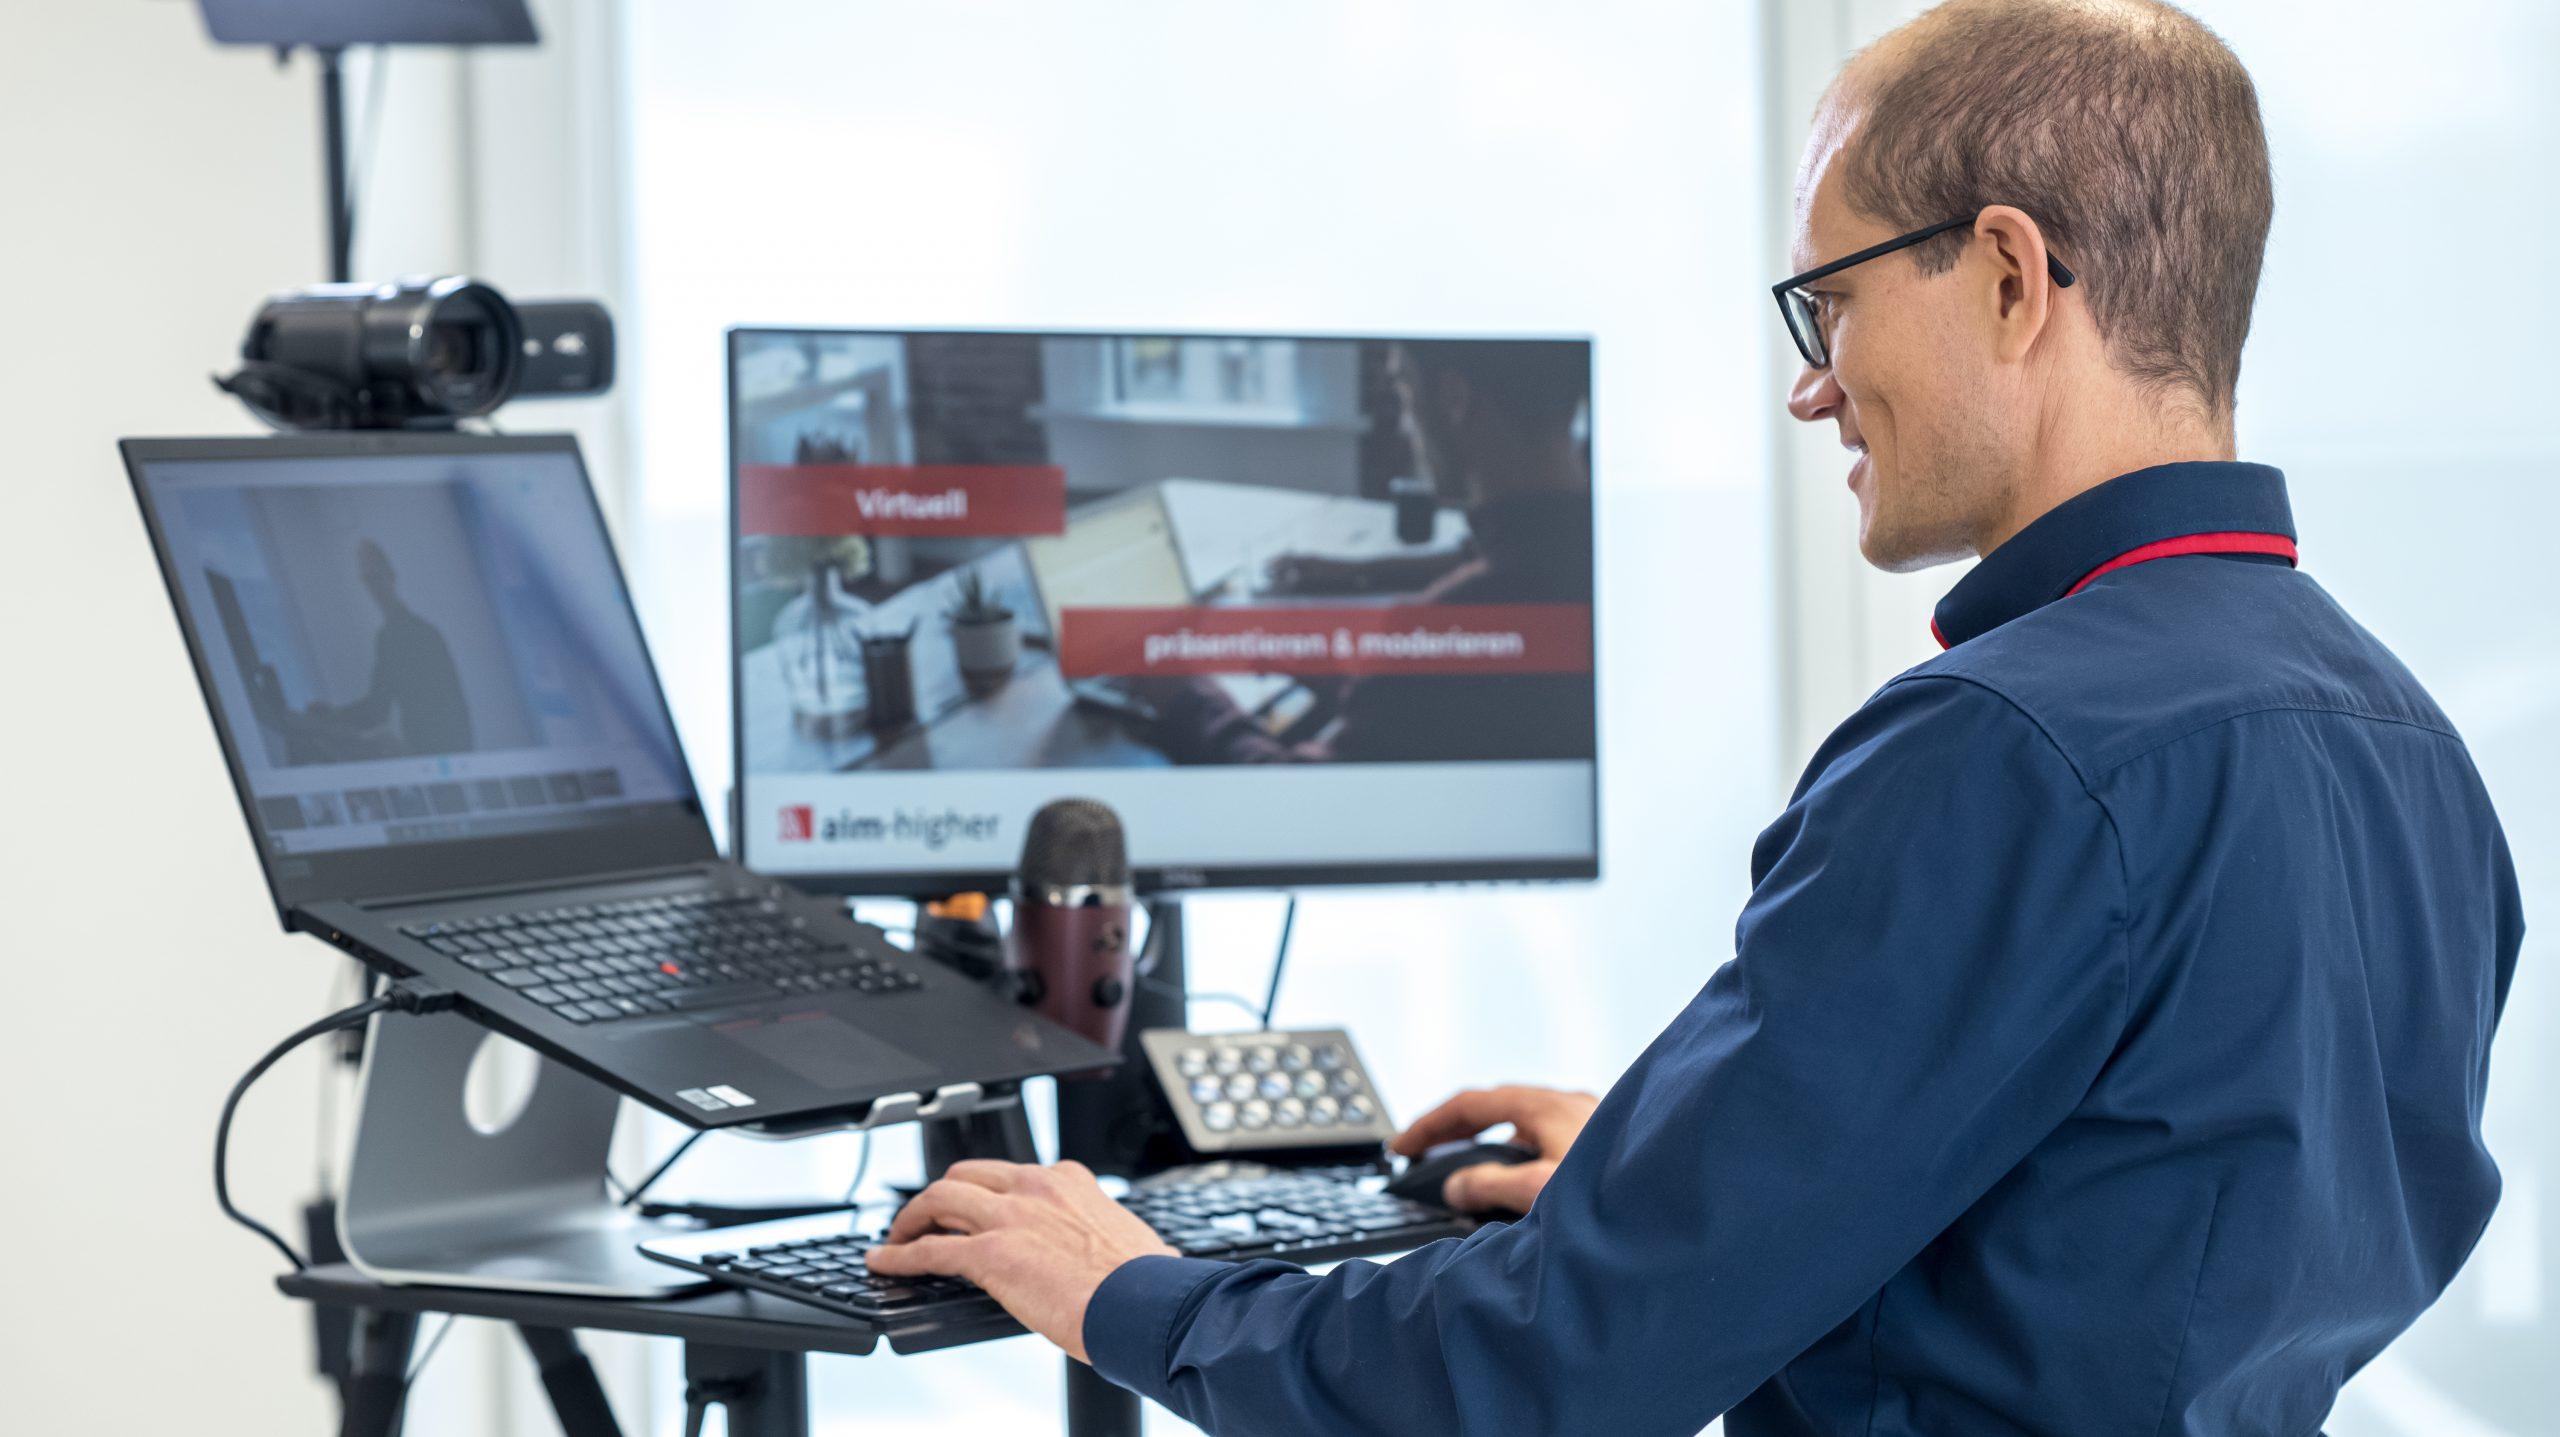 Virtuell Wissen Vermitteln Training